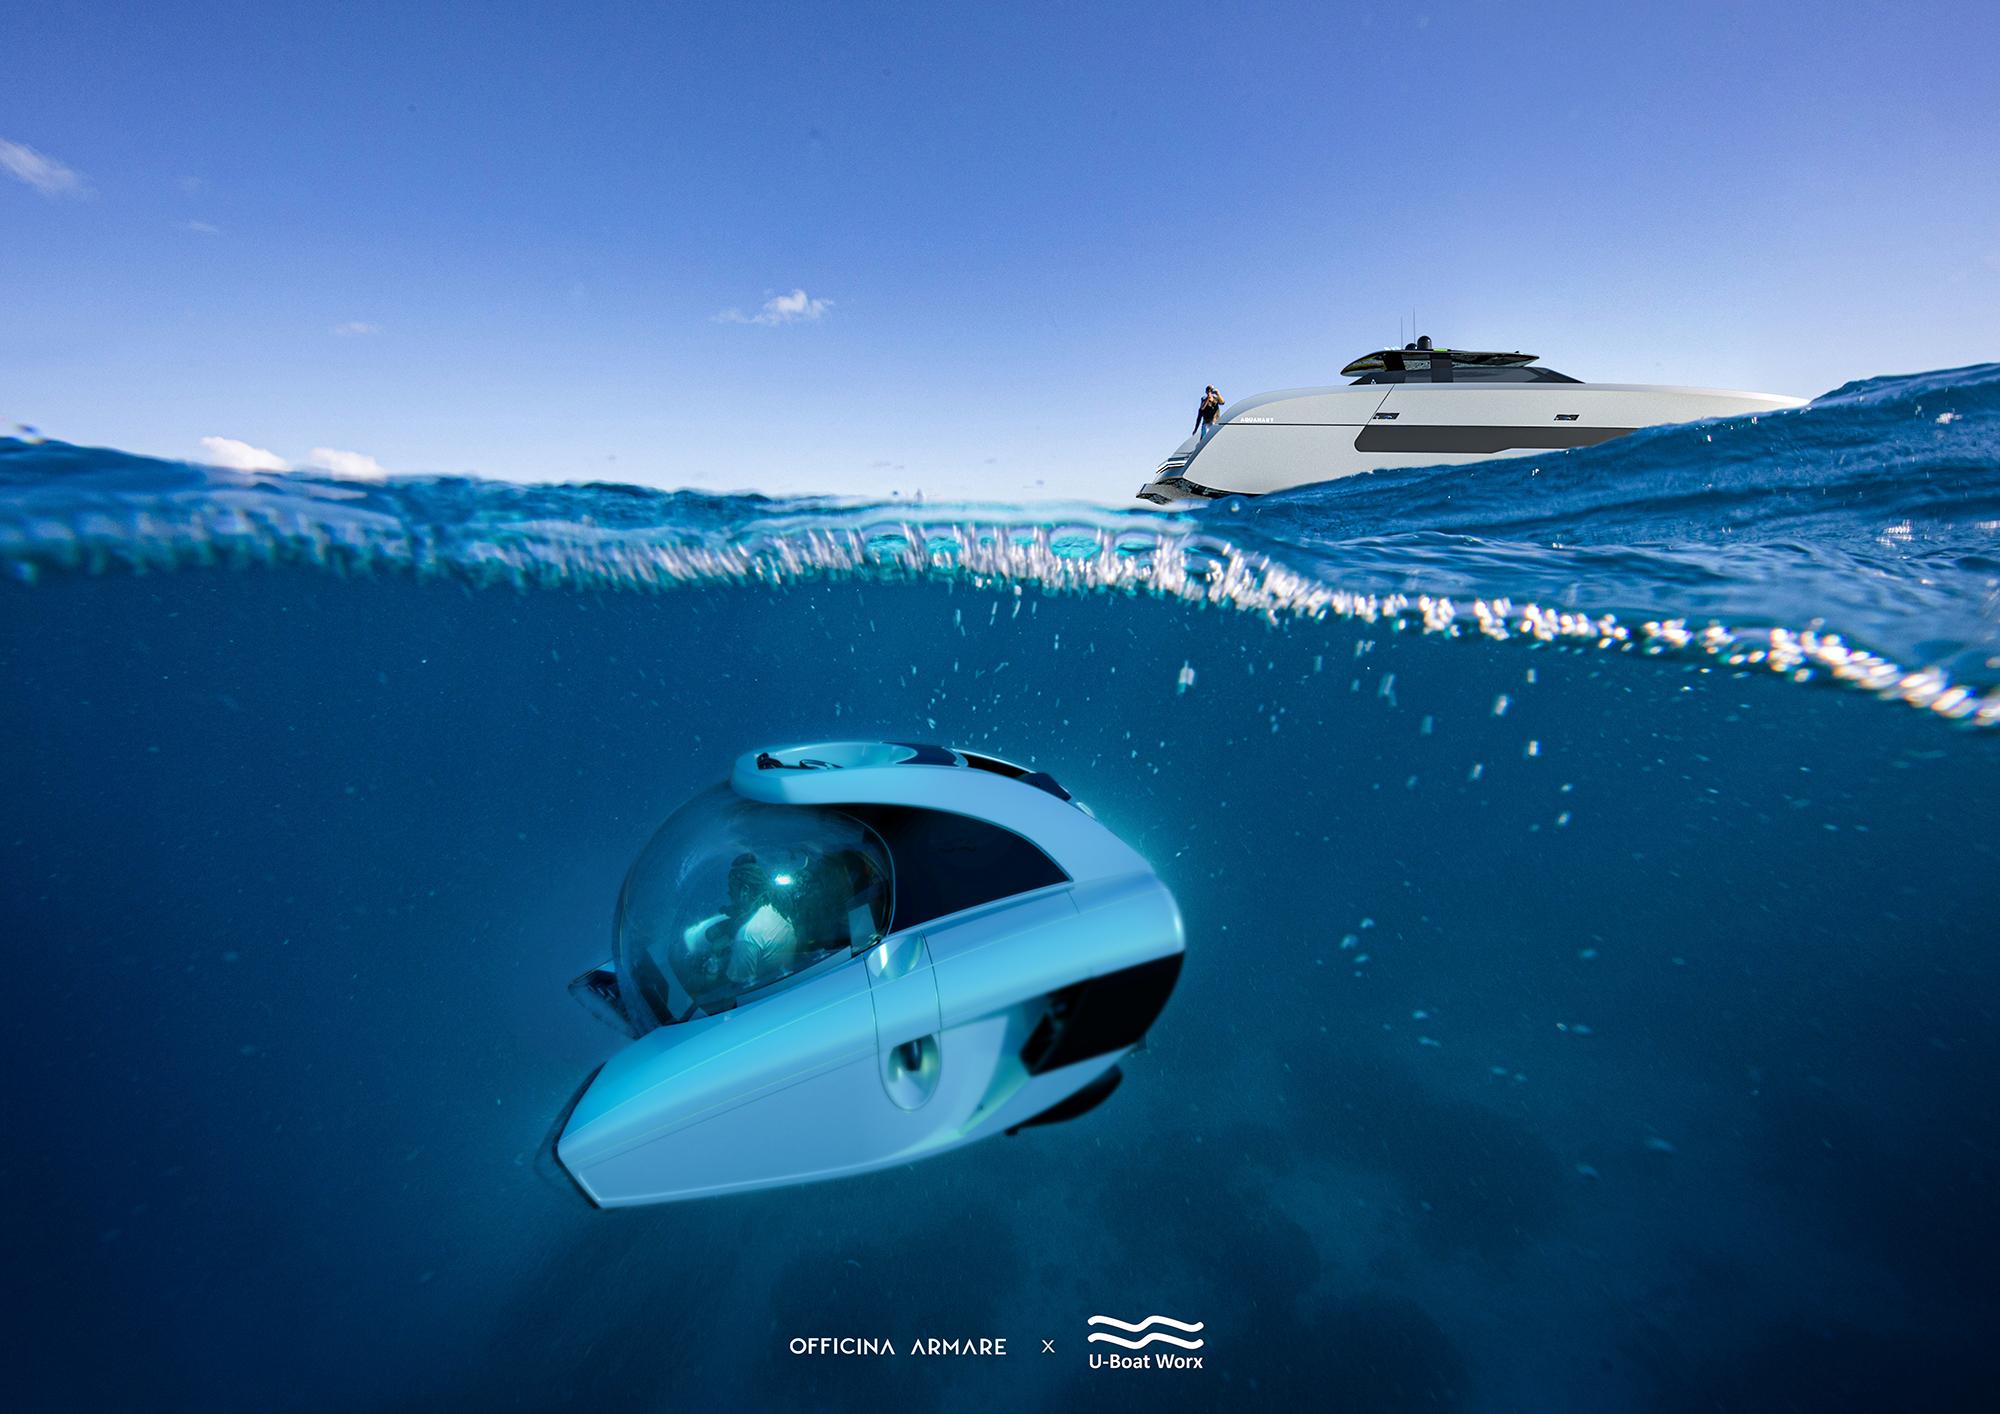 Officina Armare x U-Boat Aquanaut Catamaran